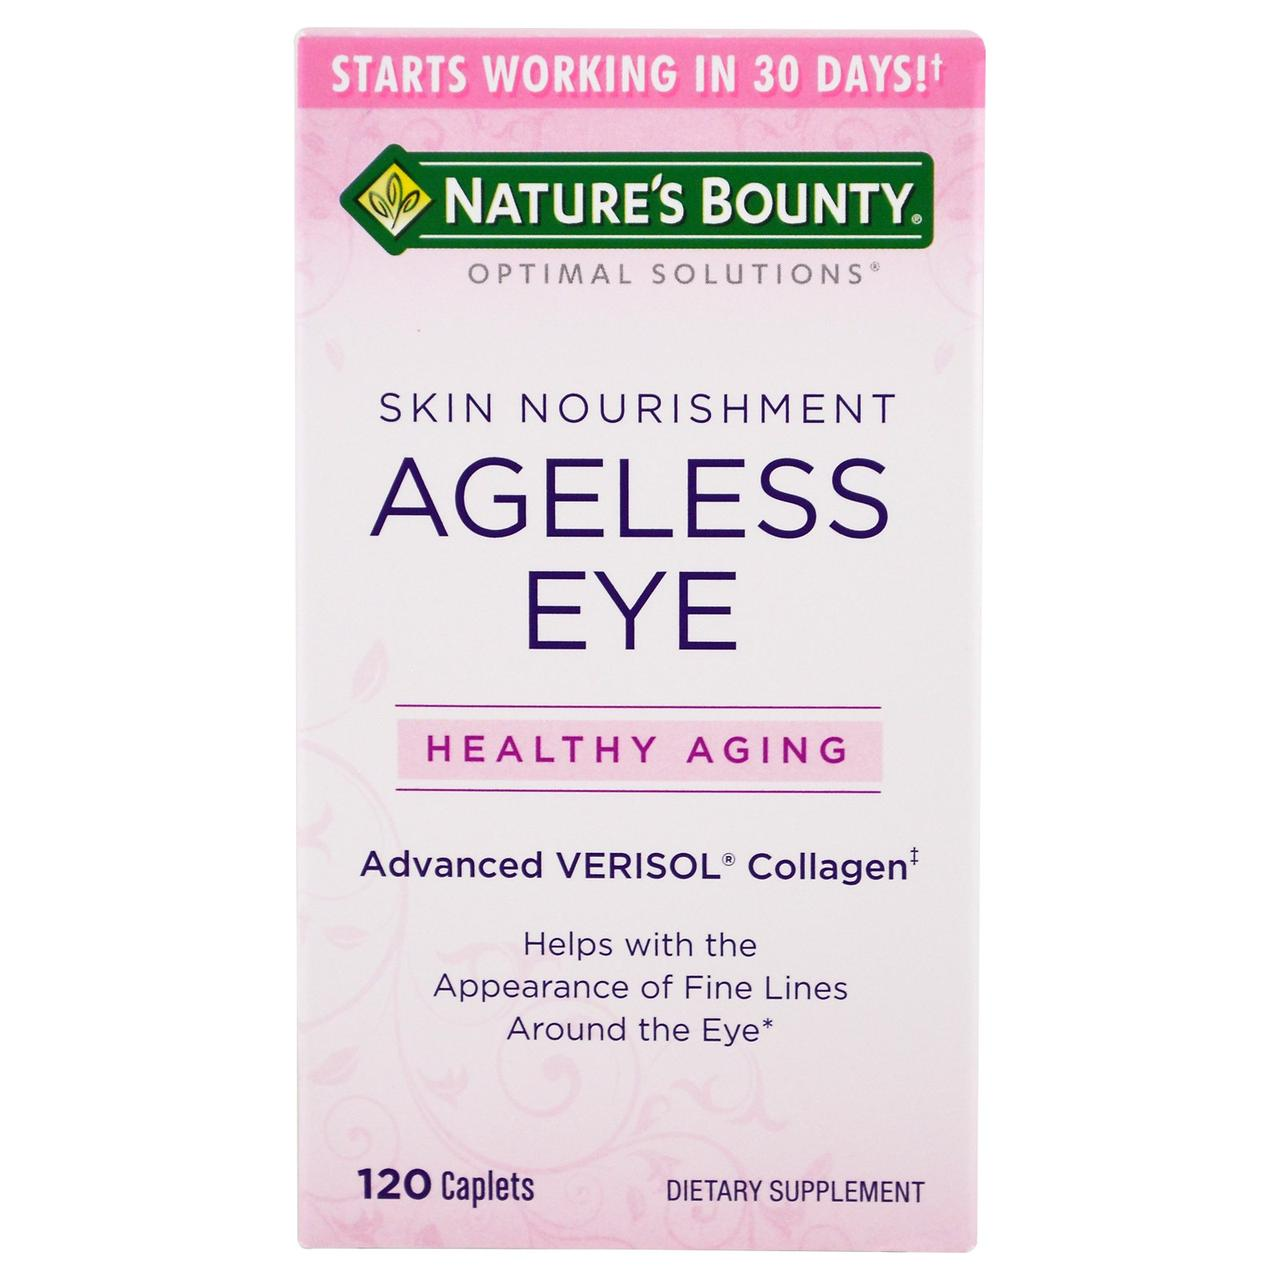 Коллаген  Nature's Bounty с биотином и витаминами для кожи, Ageless Eye, 120 капсул